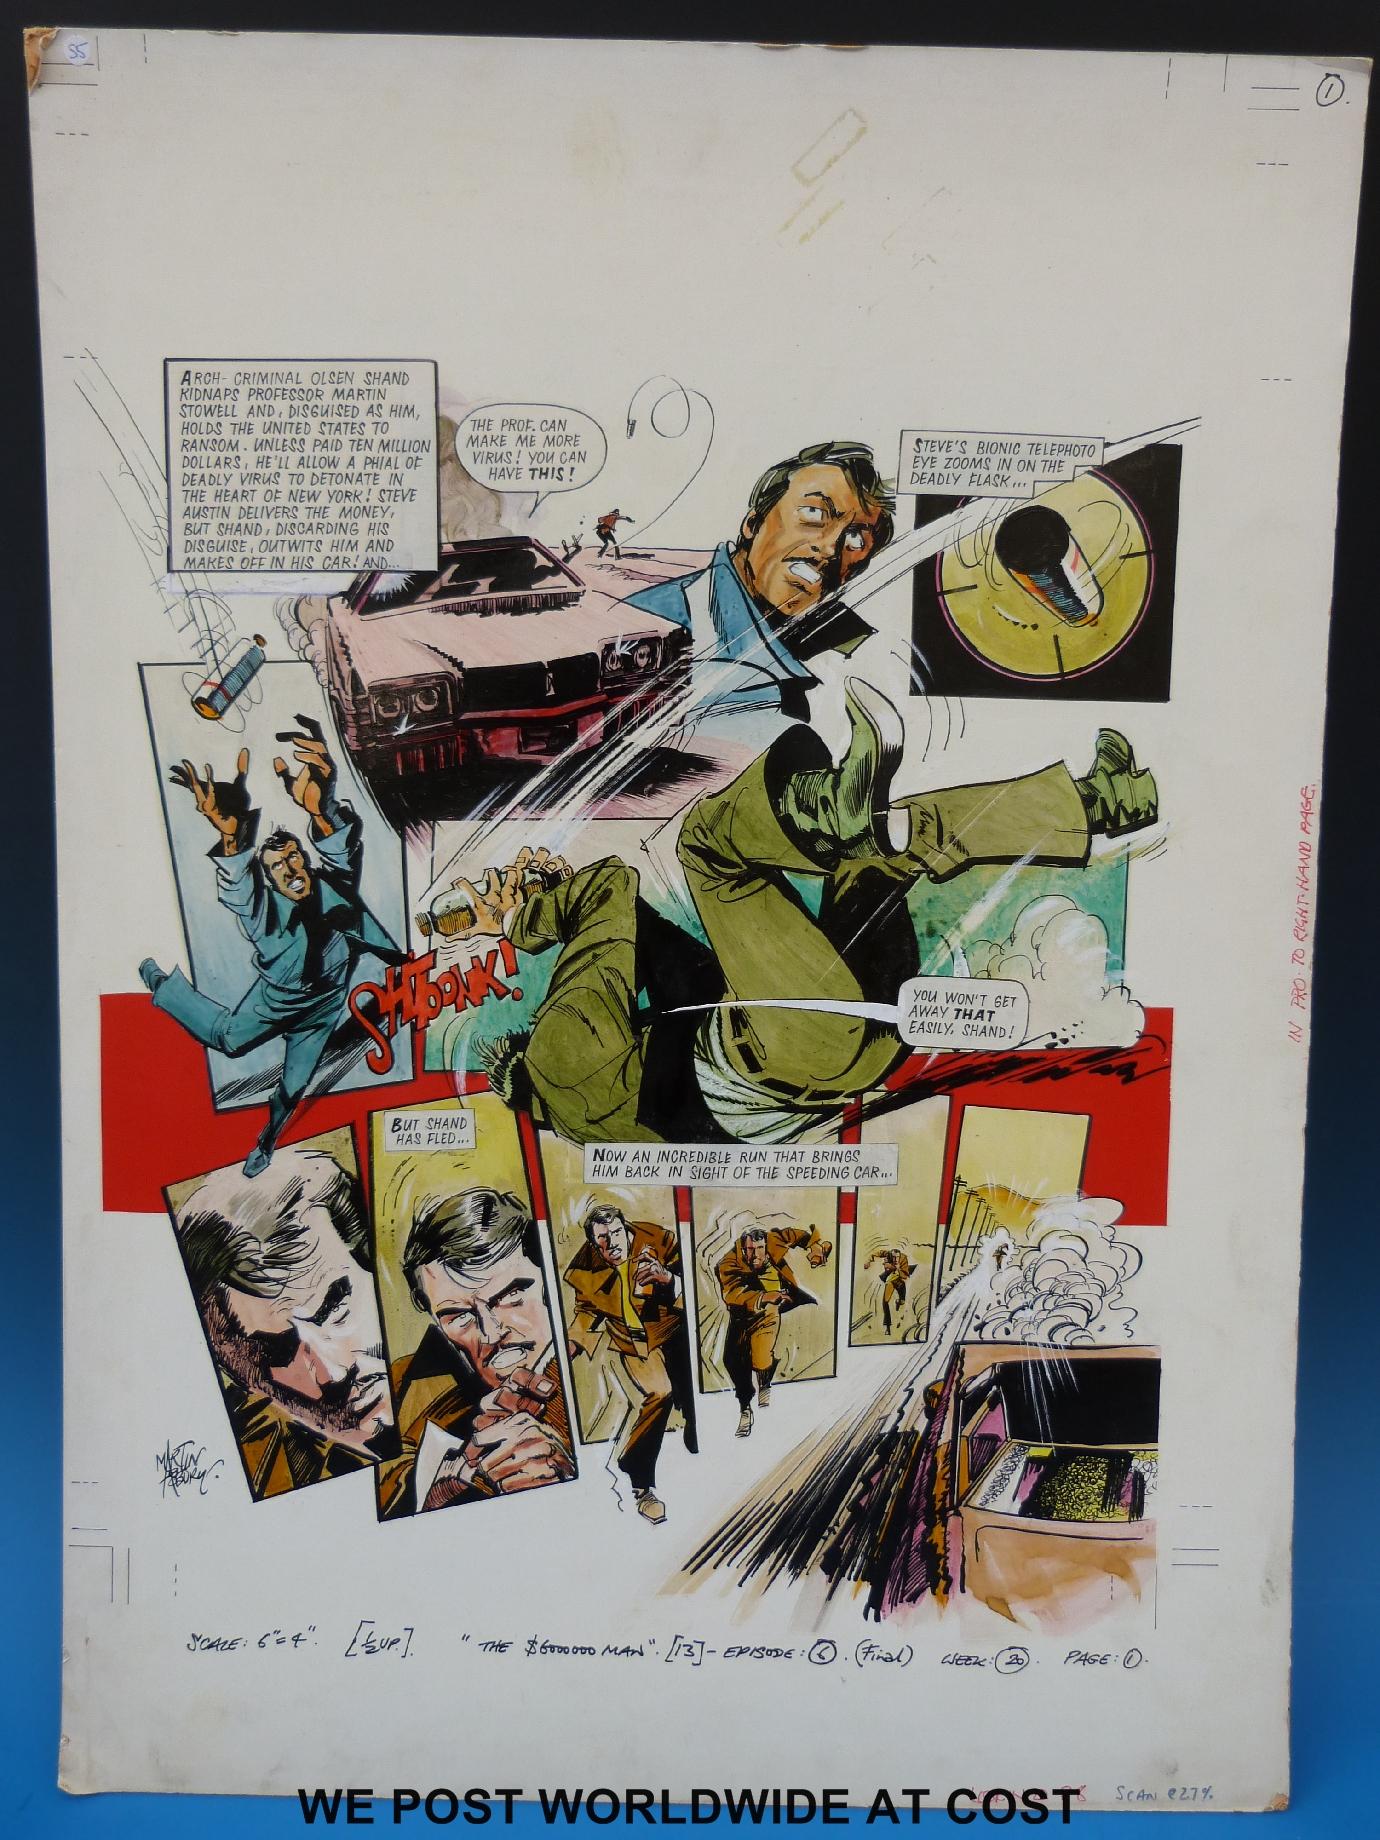 Lot 902 - Six Million Dollar Man starring Lee Majors: full colour original art page by artist Martin Asbury,